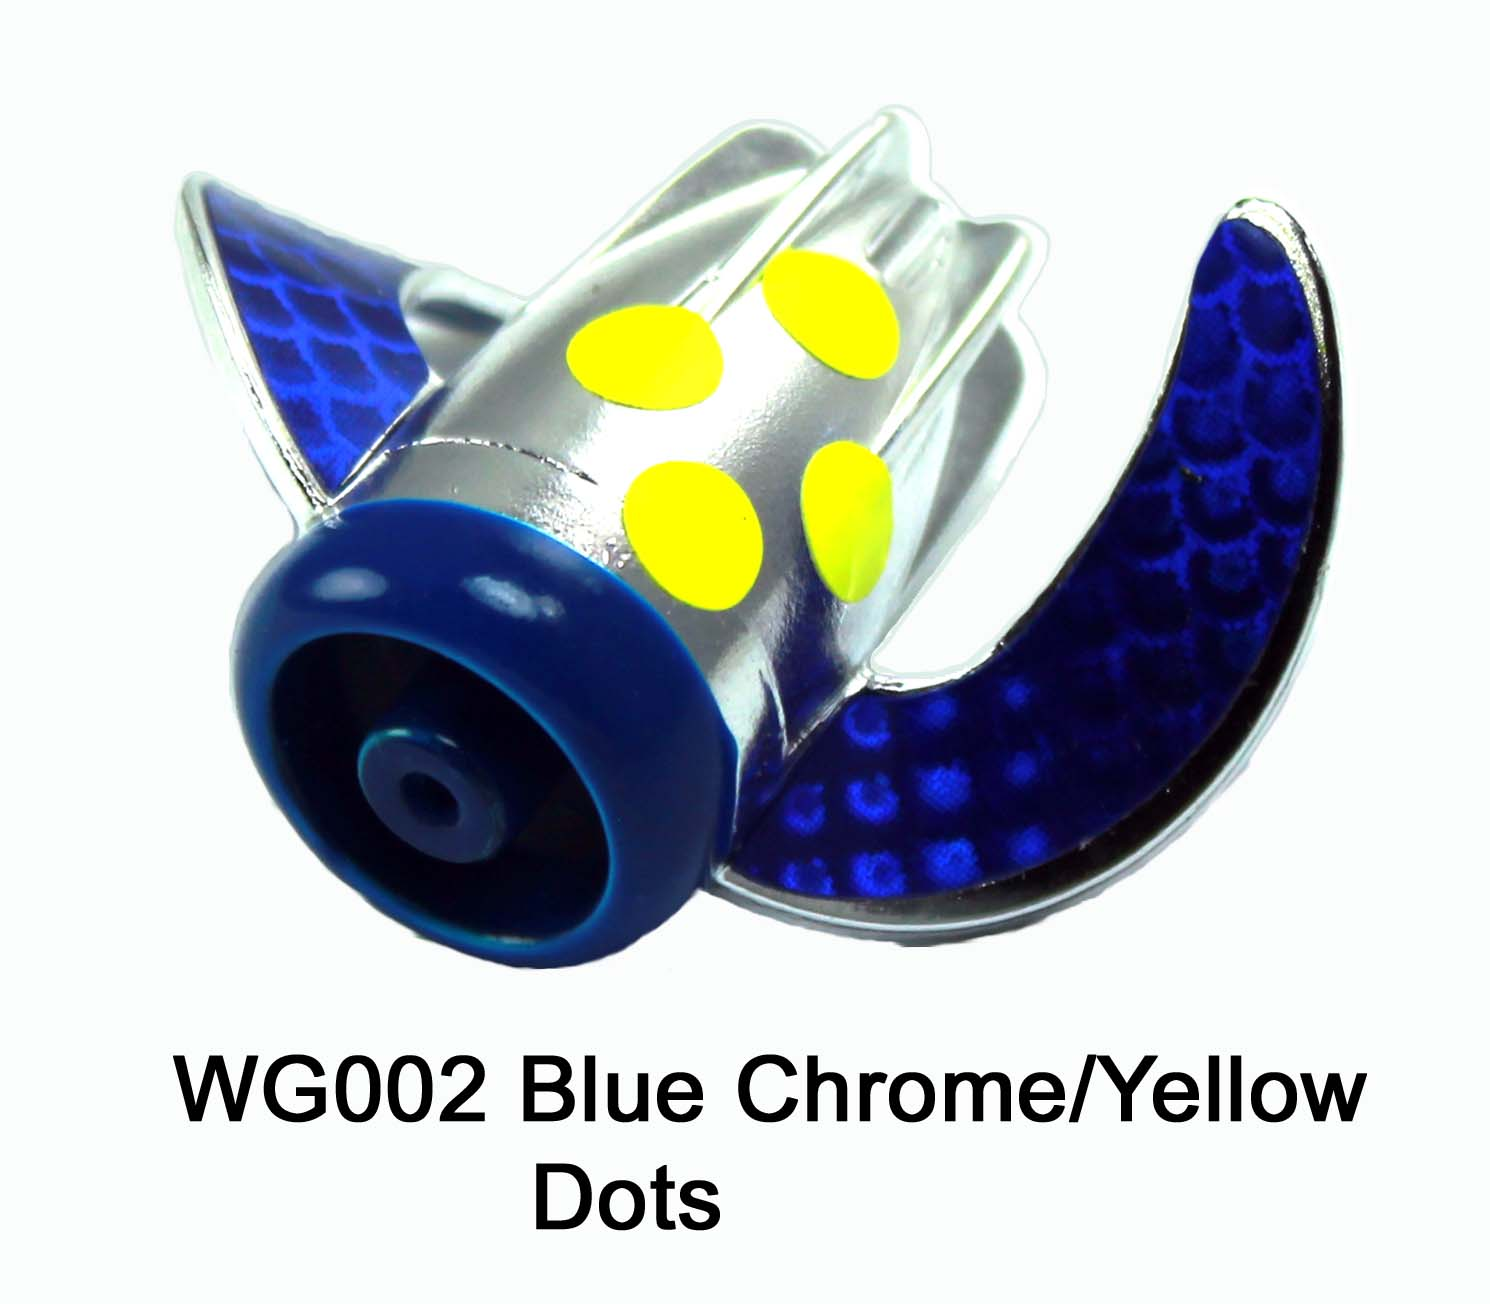 WG002 WhirlyGig Blue Chrome/Yell